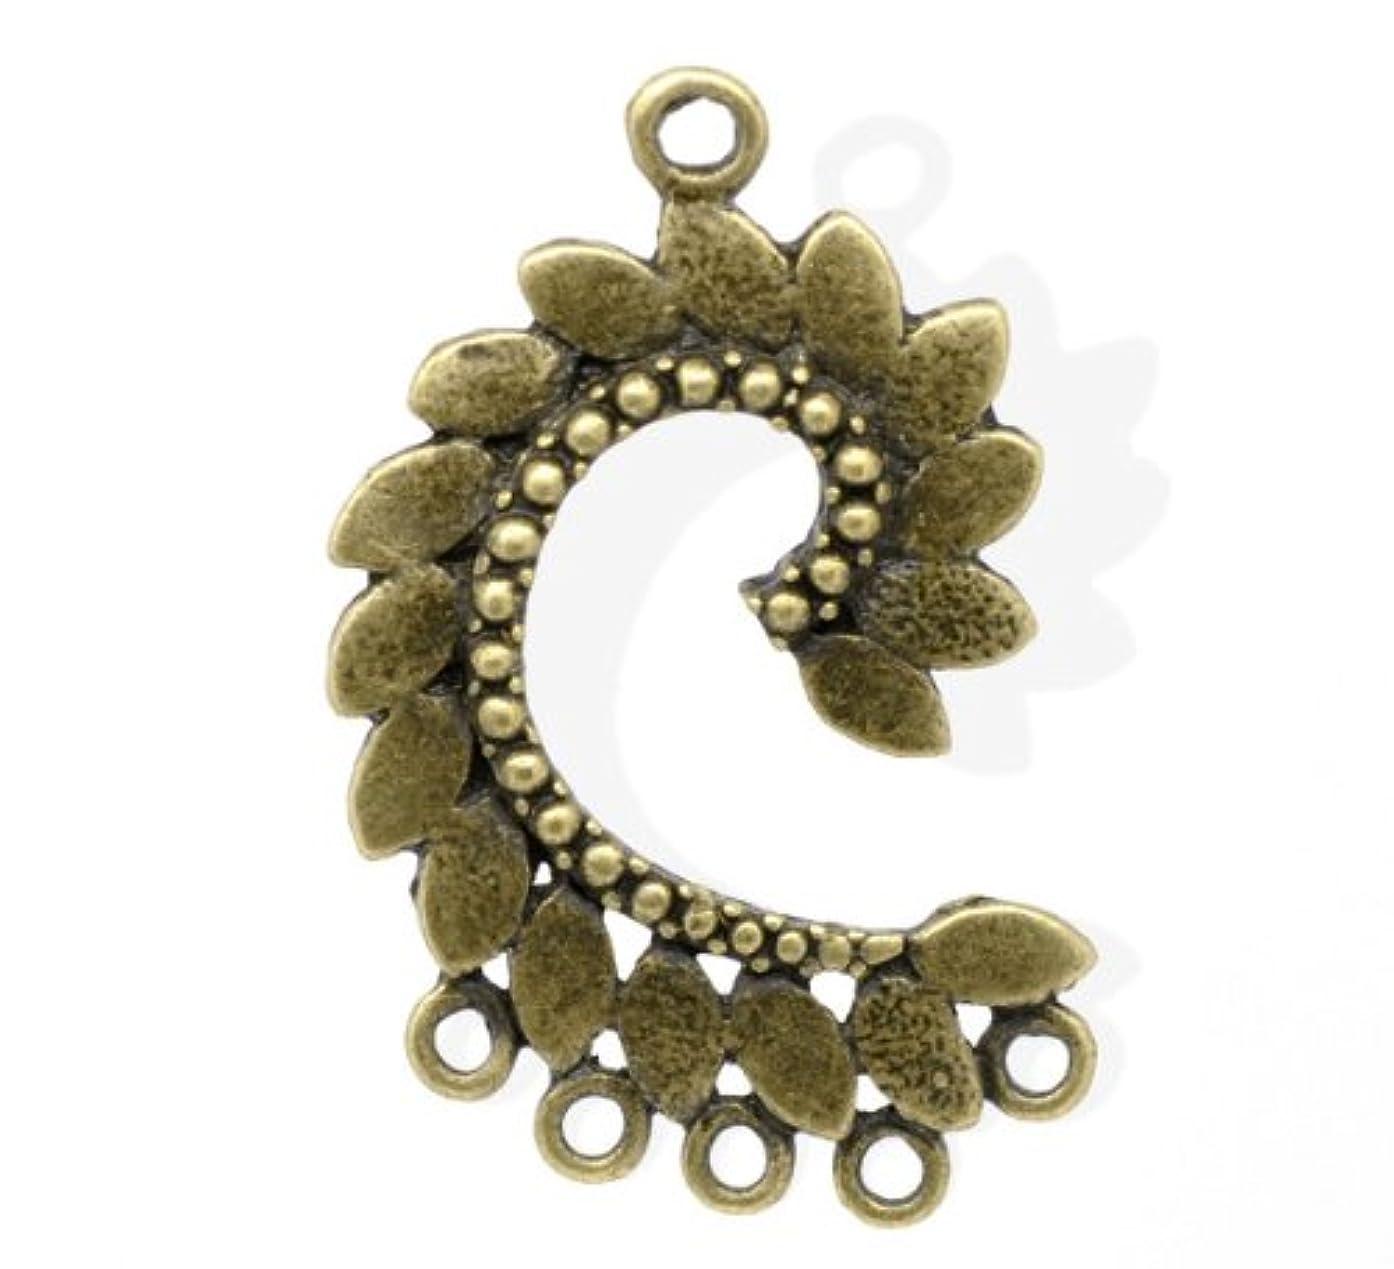 PEPPERLONELY 2pc Connectors Findings Antique Bronze 40mm x 25mm Leaf Chandelier Earring C.